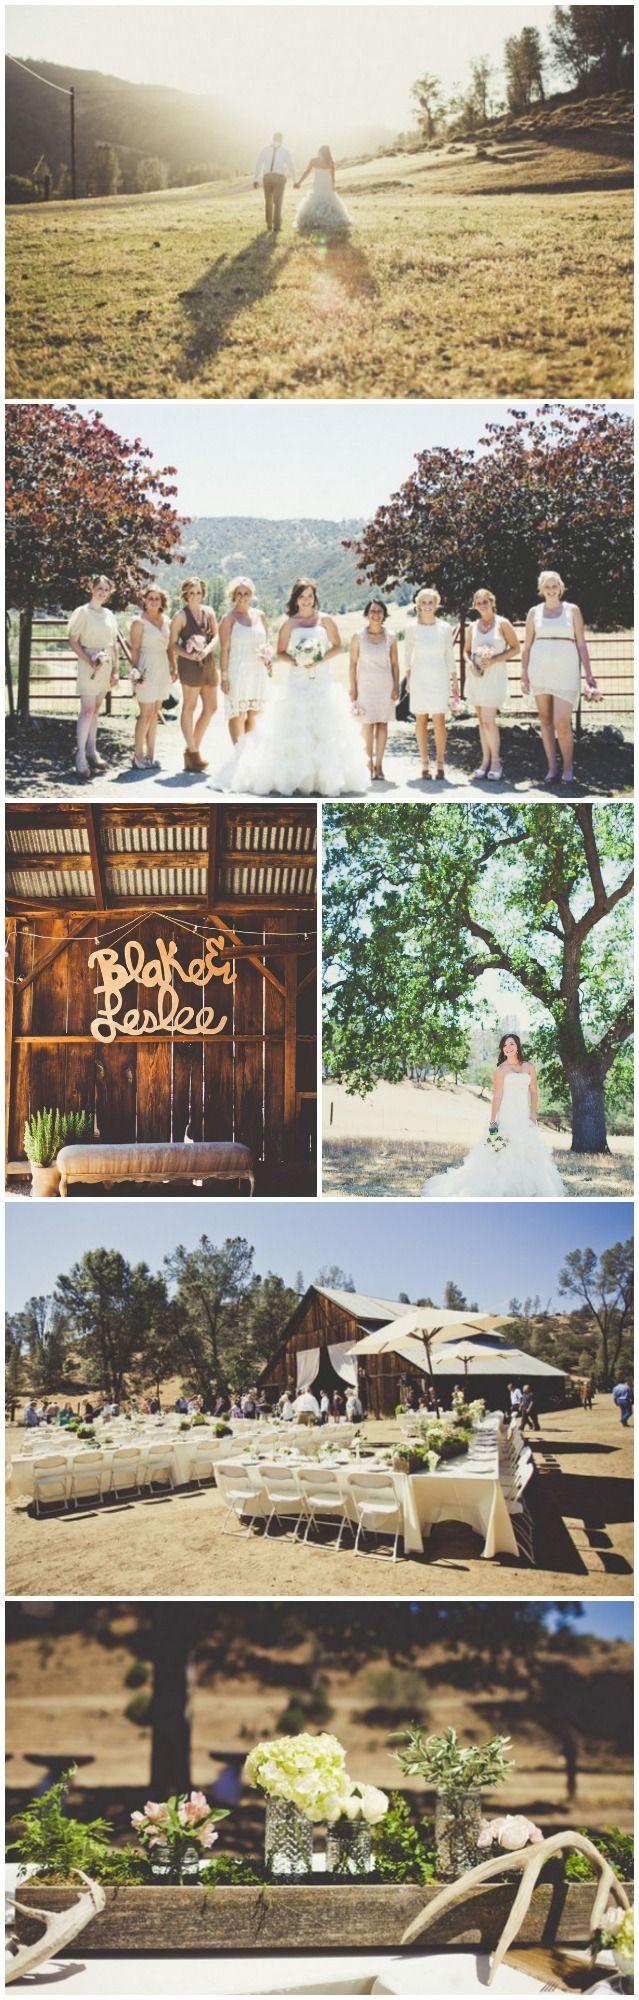 Country Rustic Barn Wedding